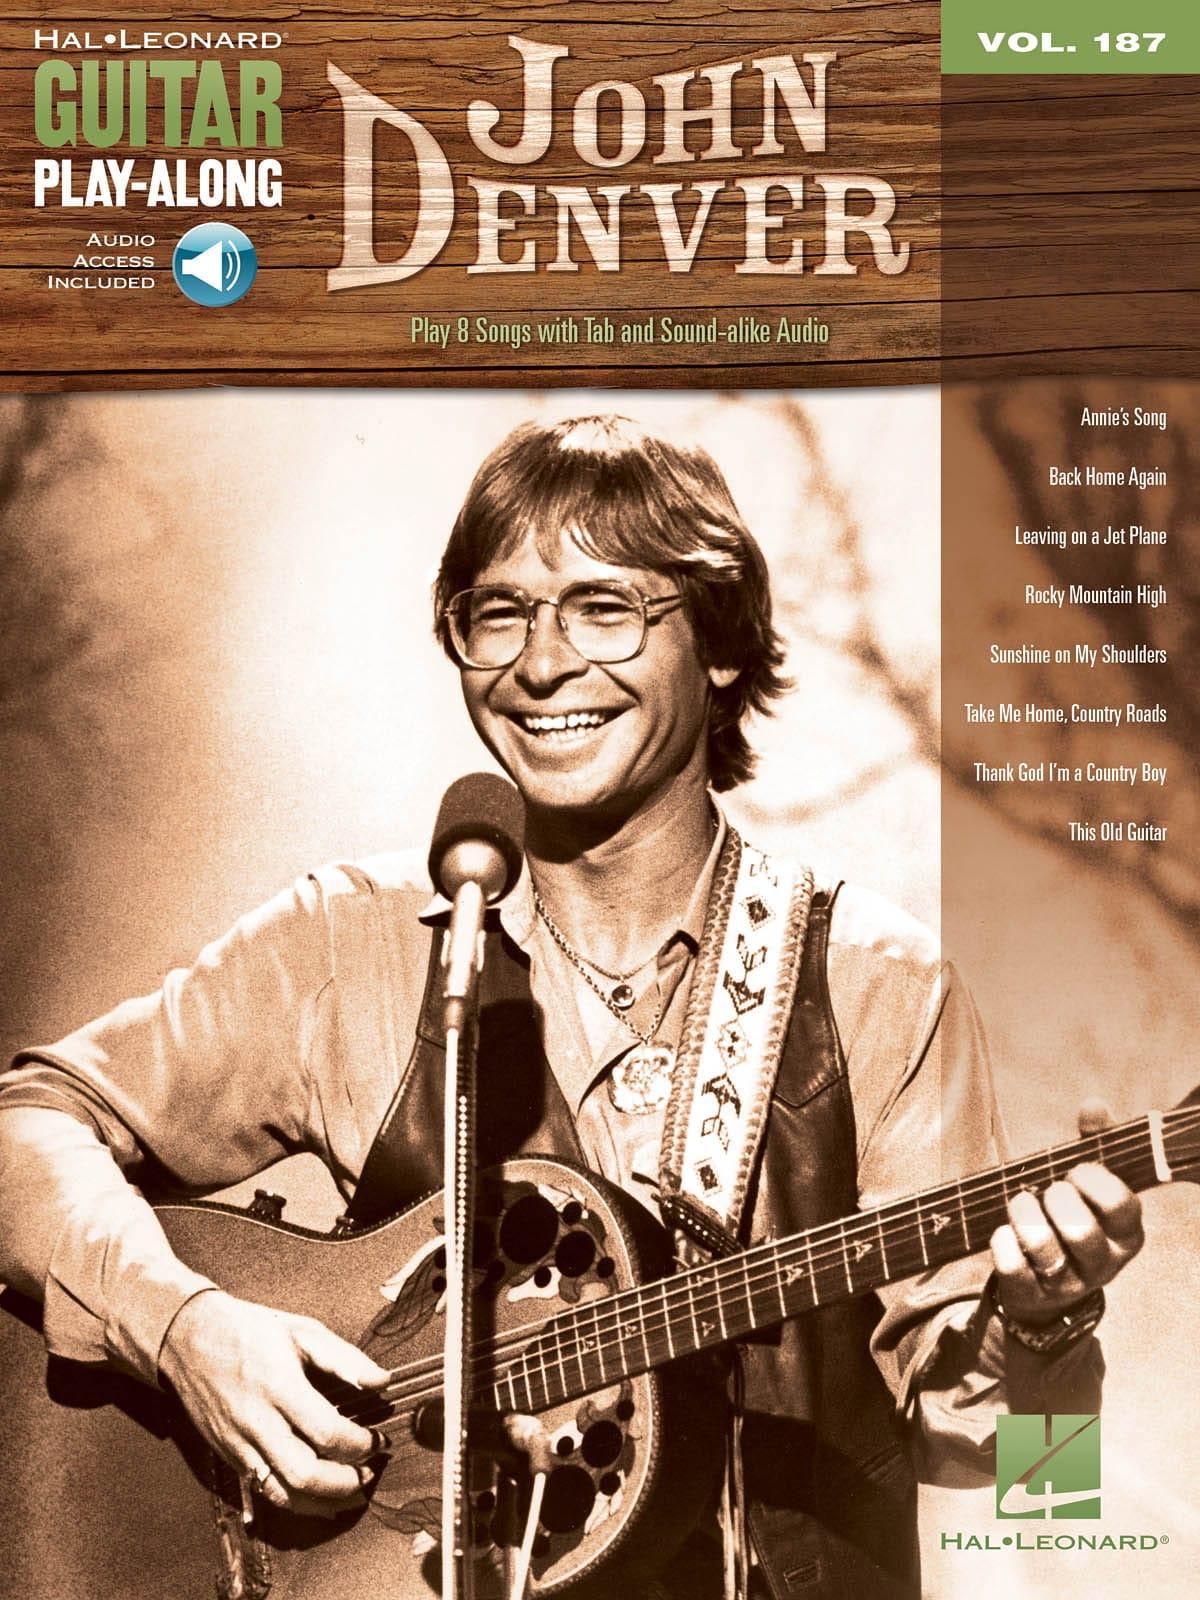 Guitar Play-Along Volume 187 John Denver - laflutedepan.com